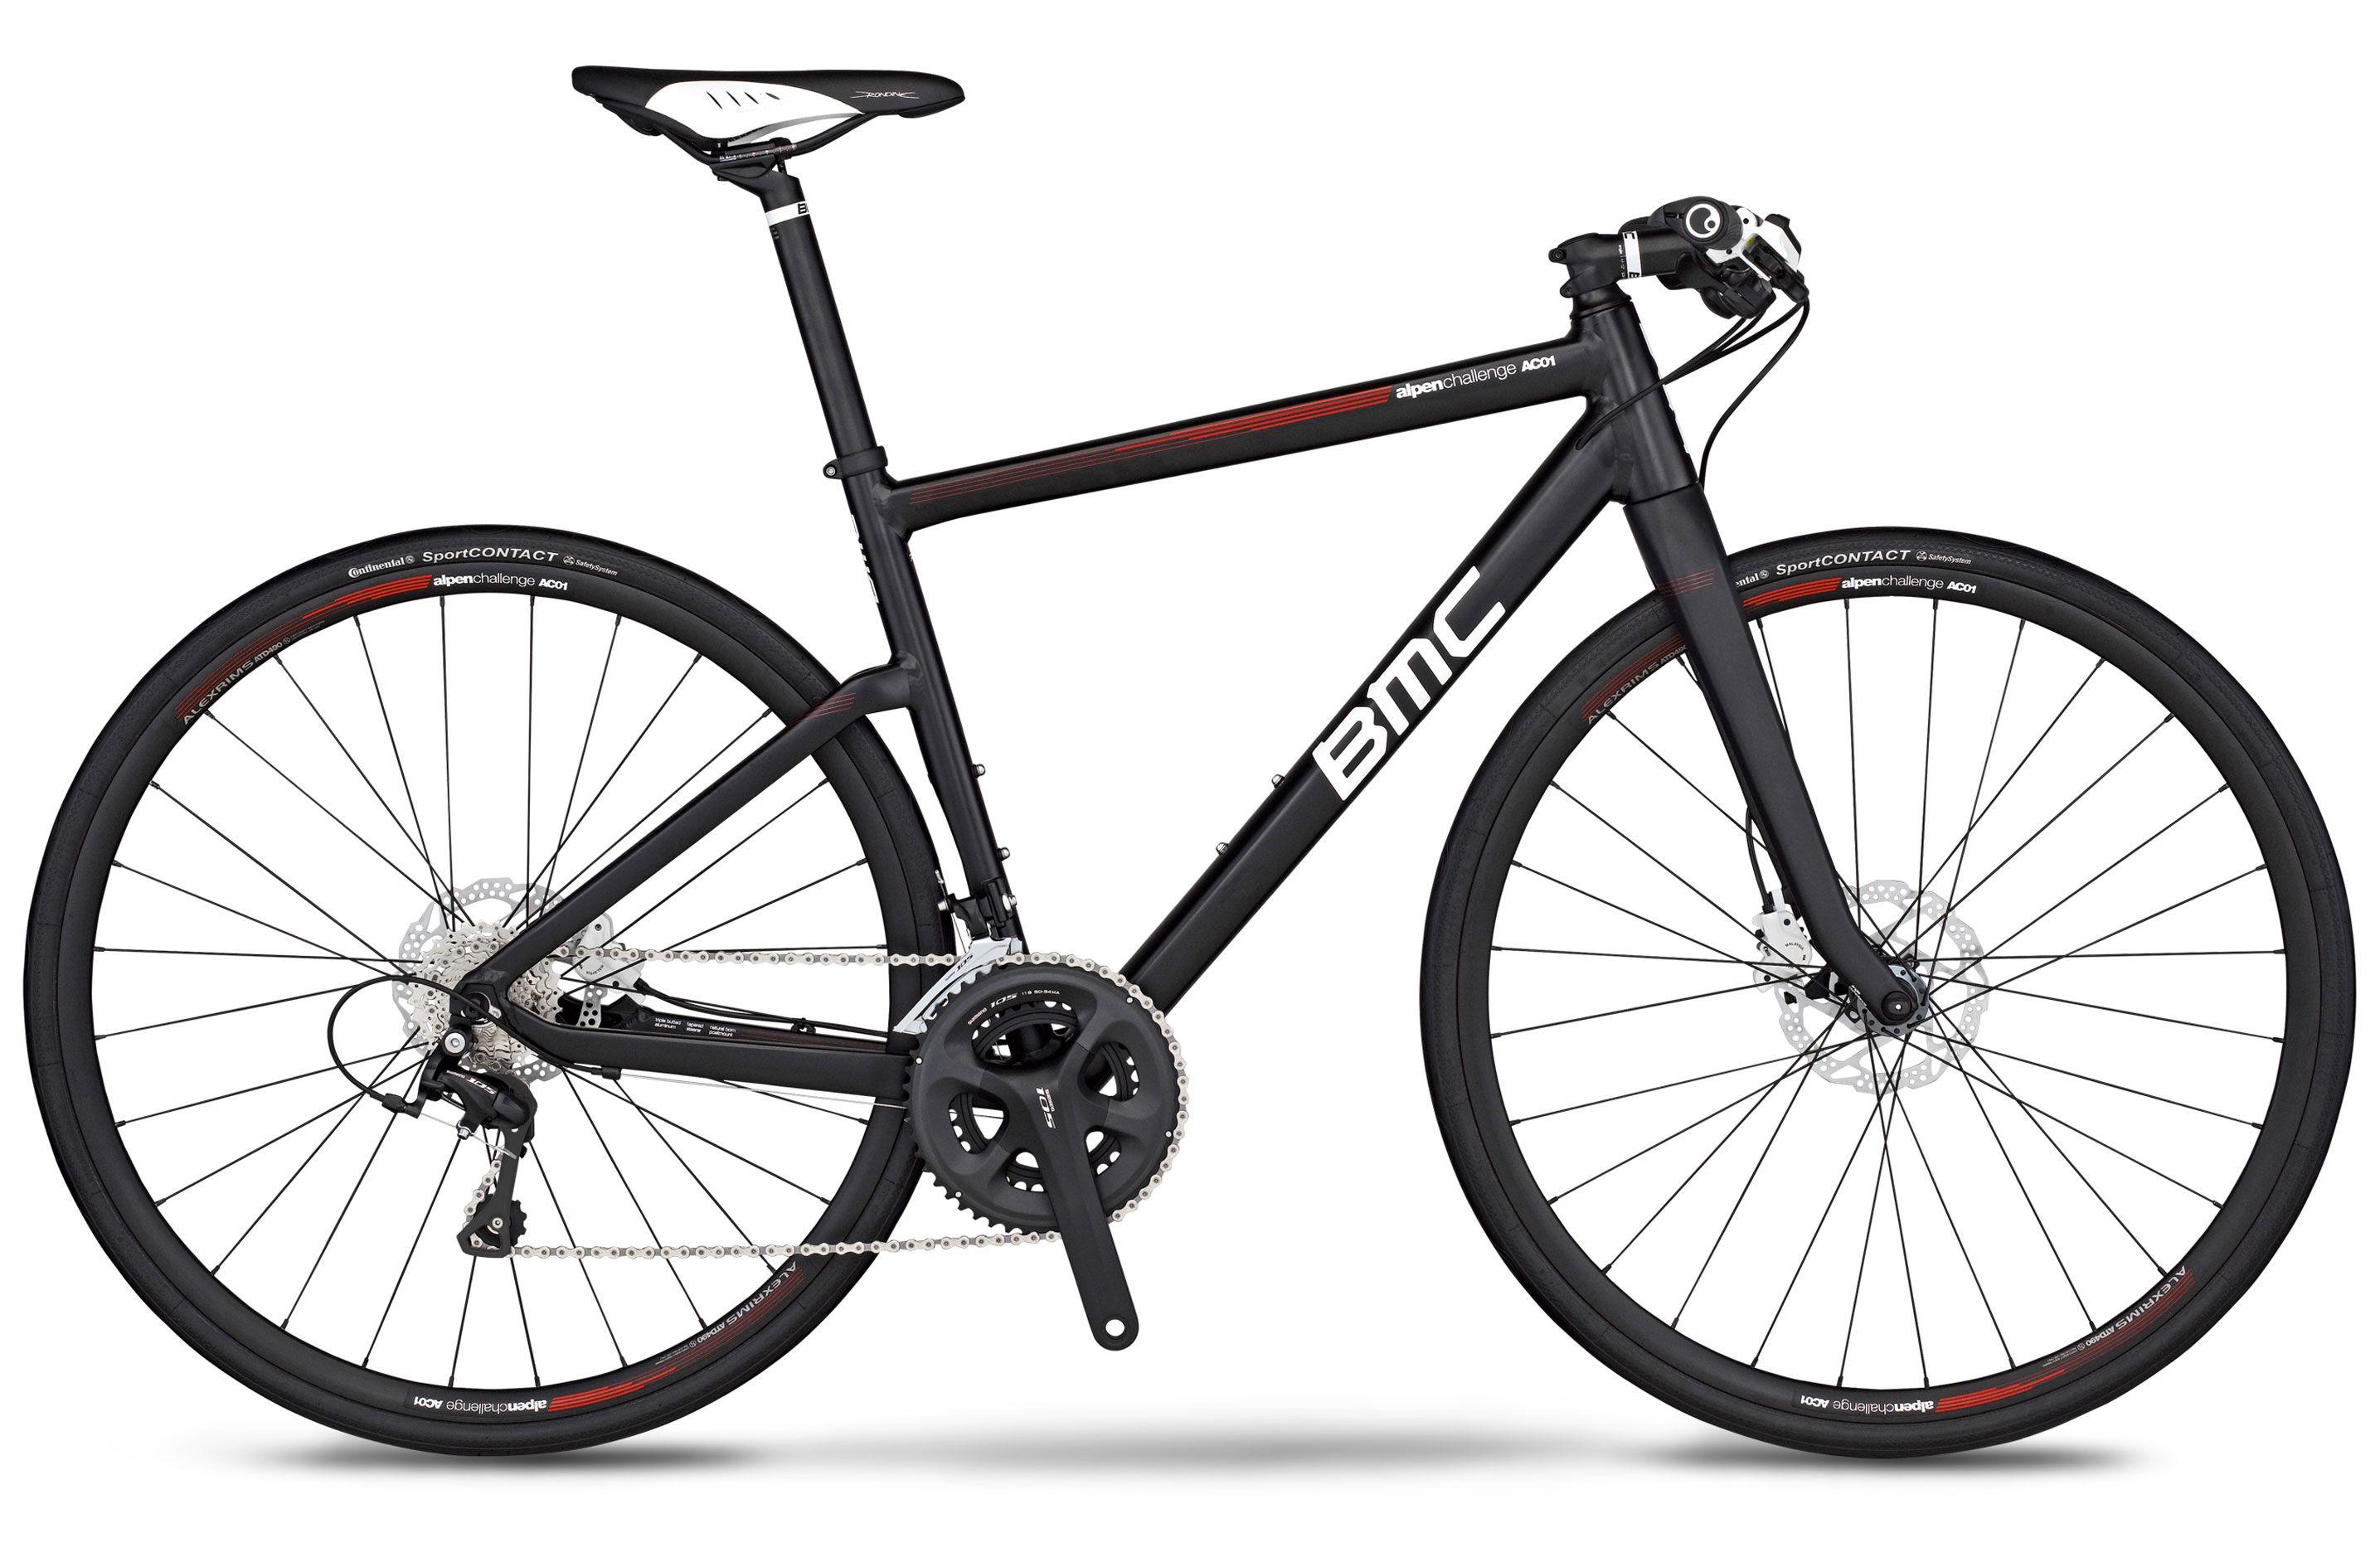 Bmc Alpenchallenge Ac01 105 2015 Hybrid Bike Jpg 2870 1890